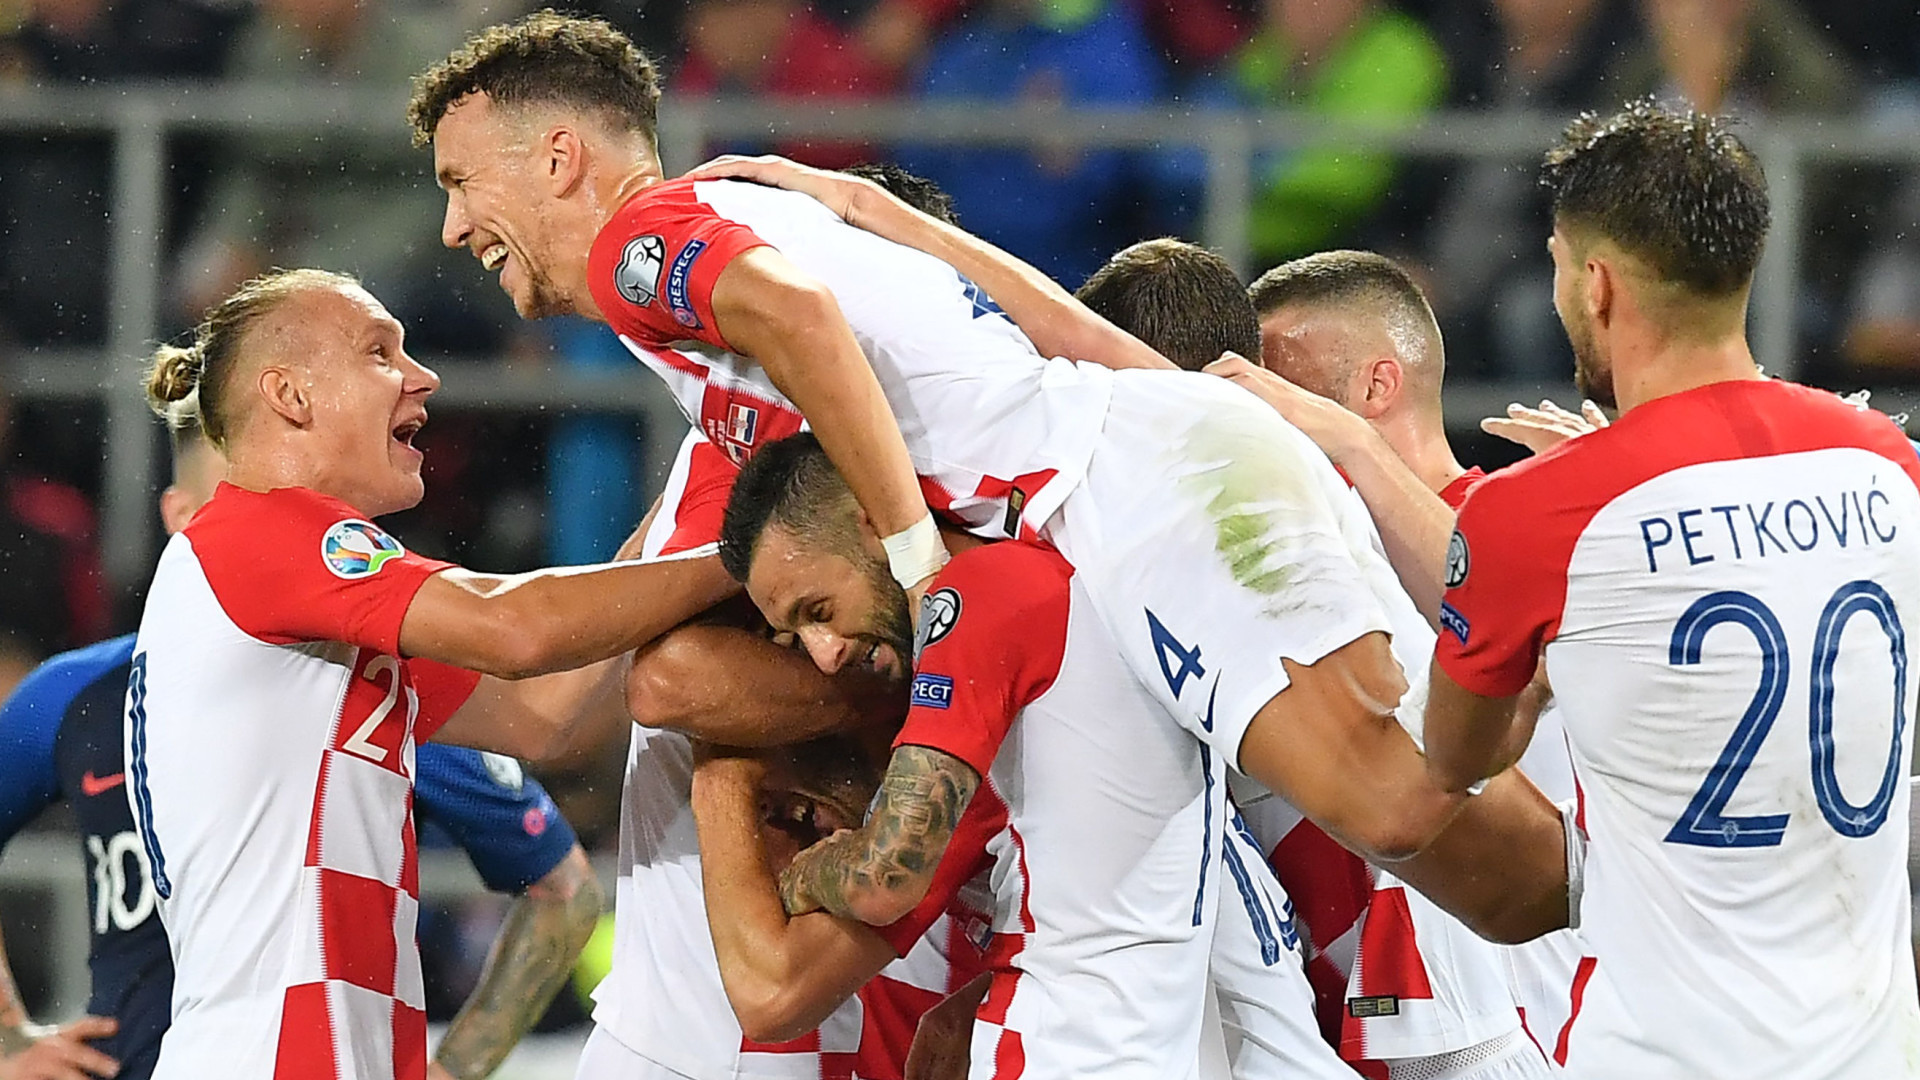 Хорватия – Словакия. Прогноз отборочного матча на Евро-2020.